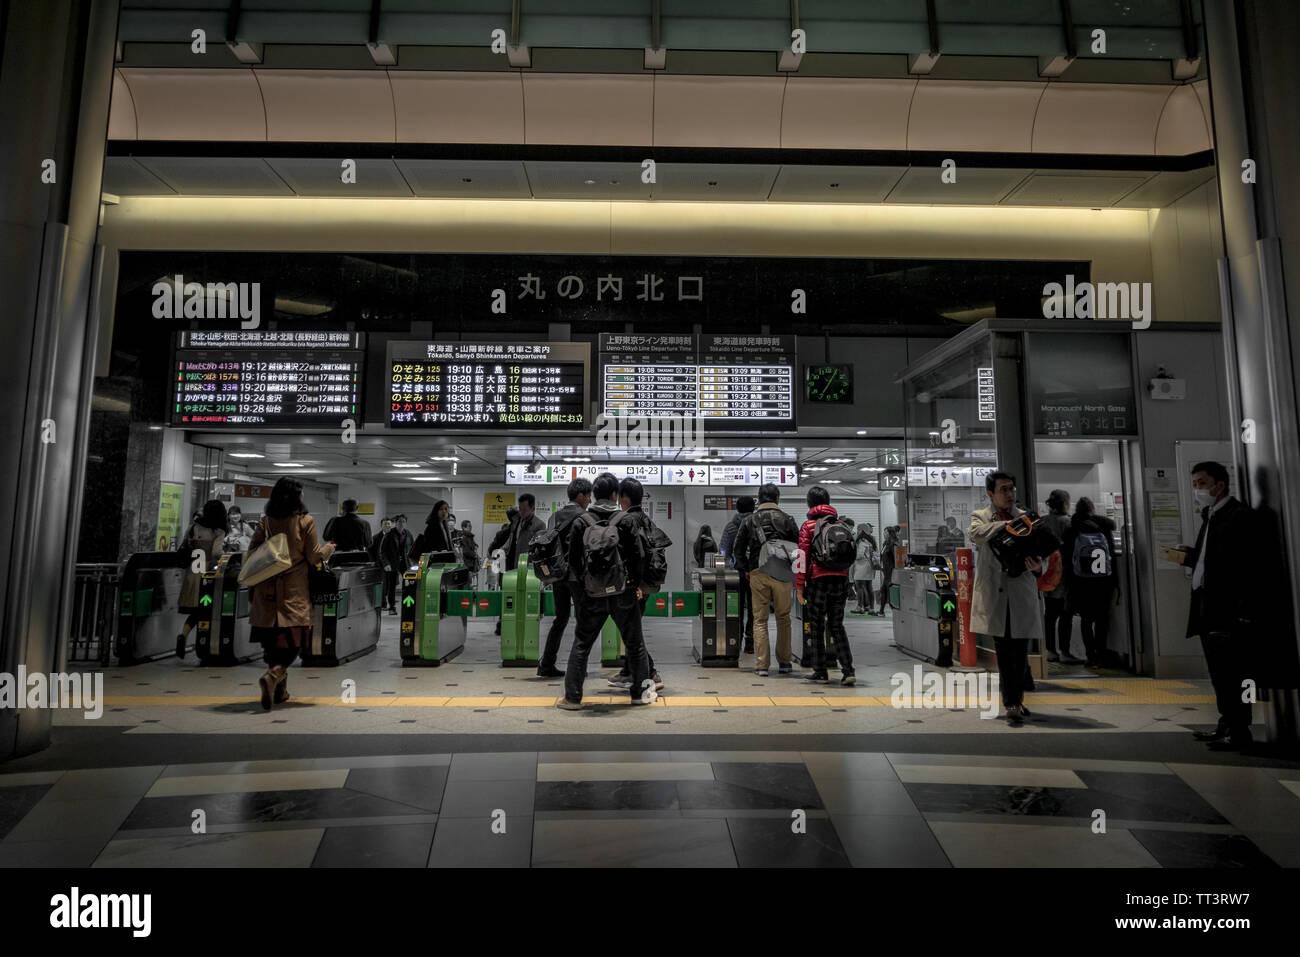 Tokyo, Japan. April 3, 2017. Passengers entering and leaving Tokyo station. Stock Photo